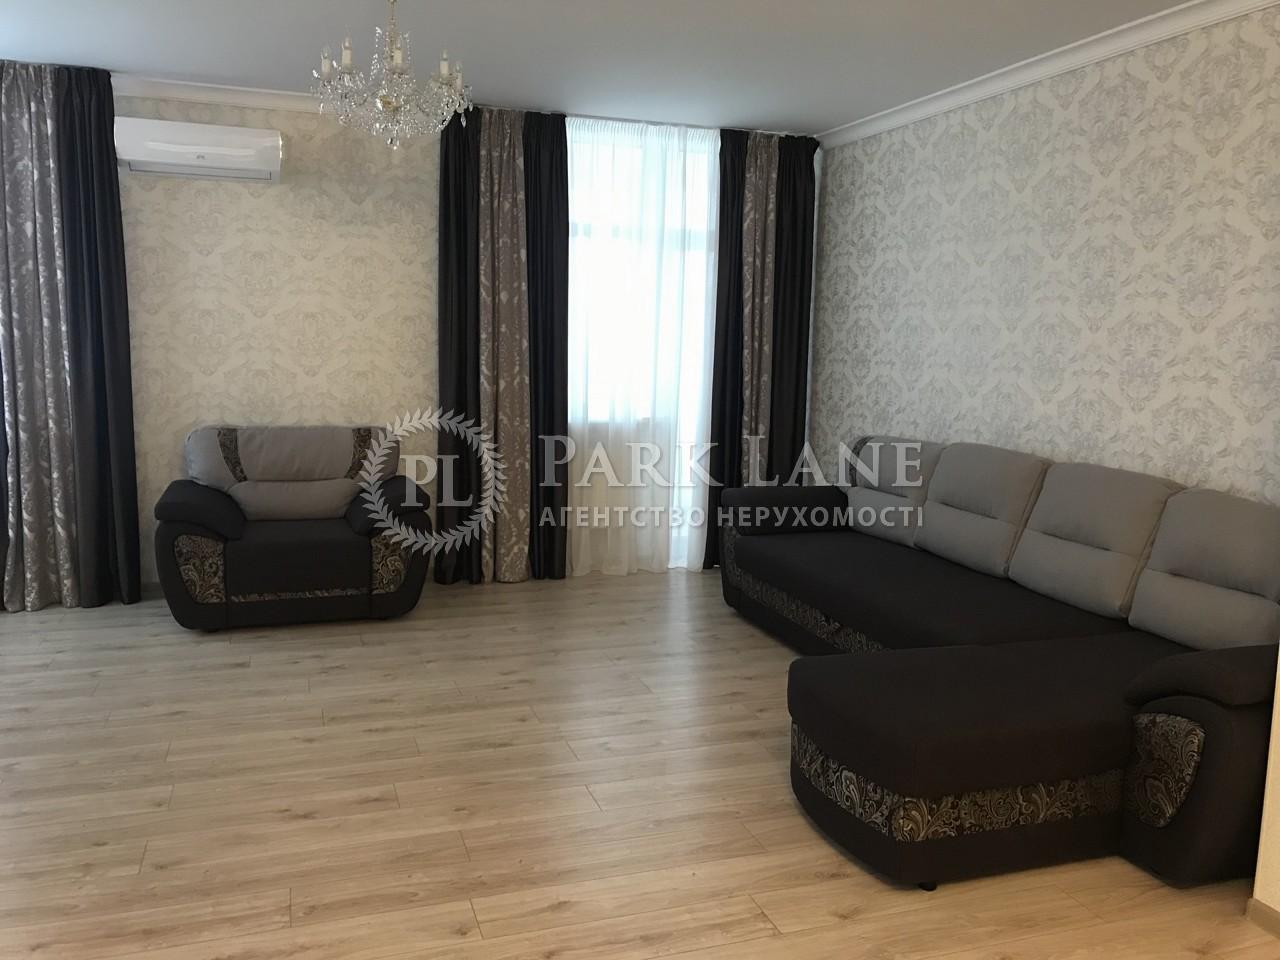 Квартира ул. Пчелки Елены, 3в, Киев, Z-482483 - Фото 4